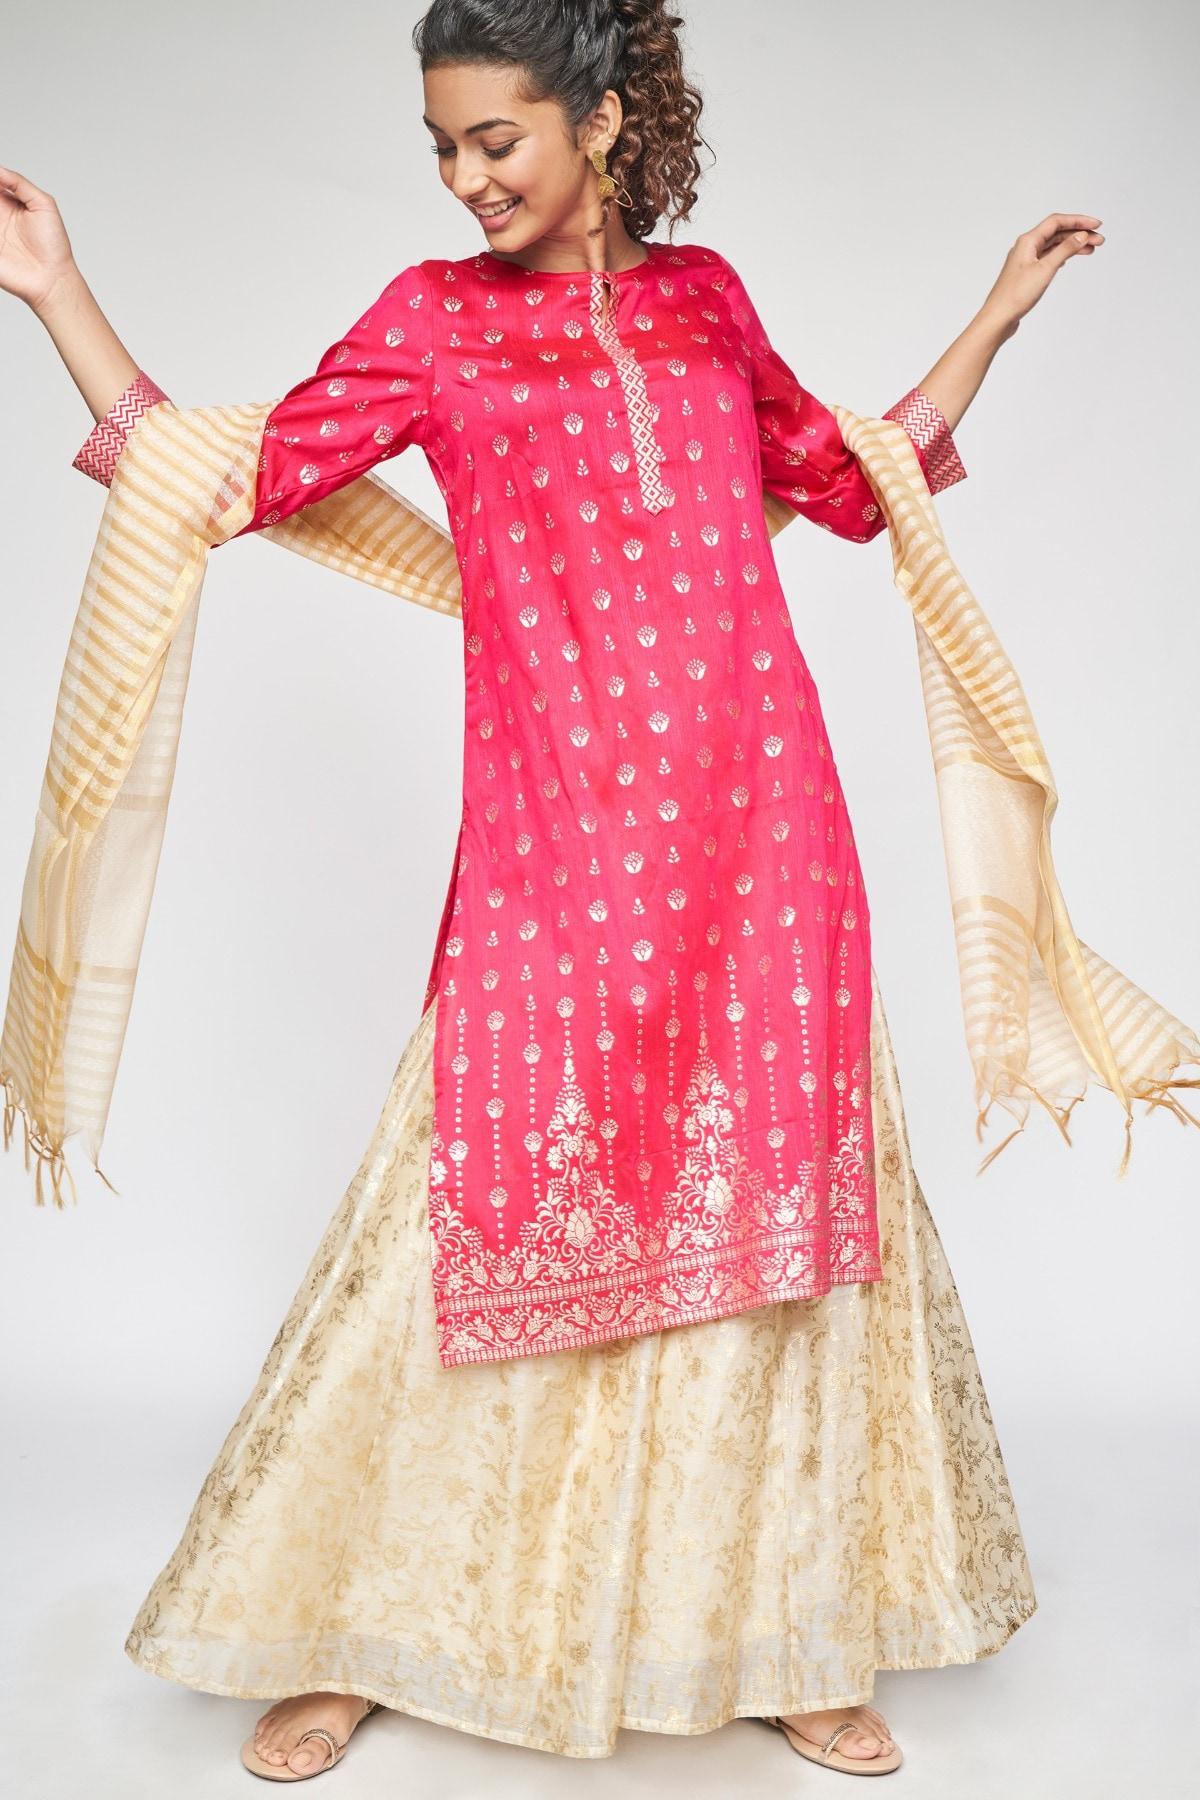 Global Desi | Hot Pink Ethnic Motifs Straight Kurta